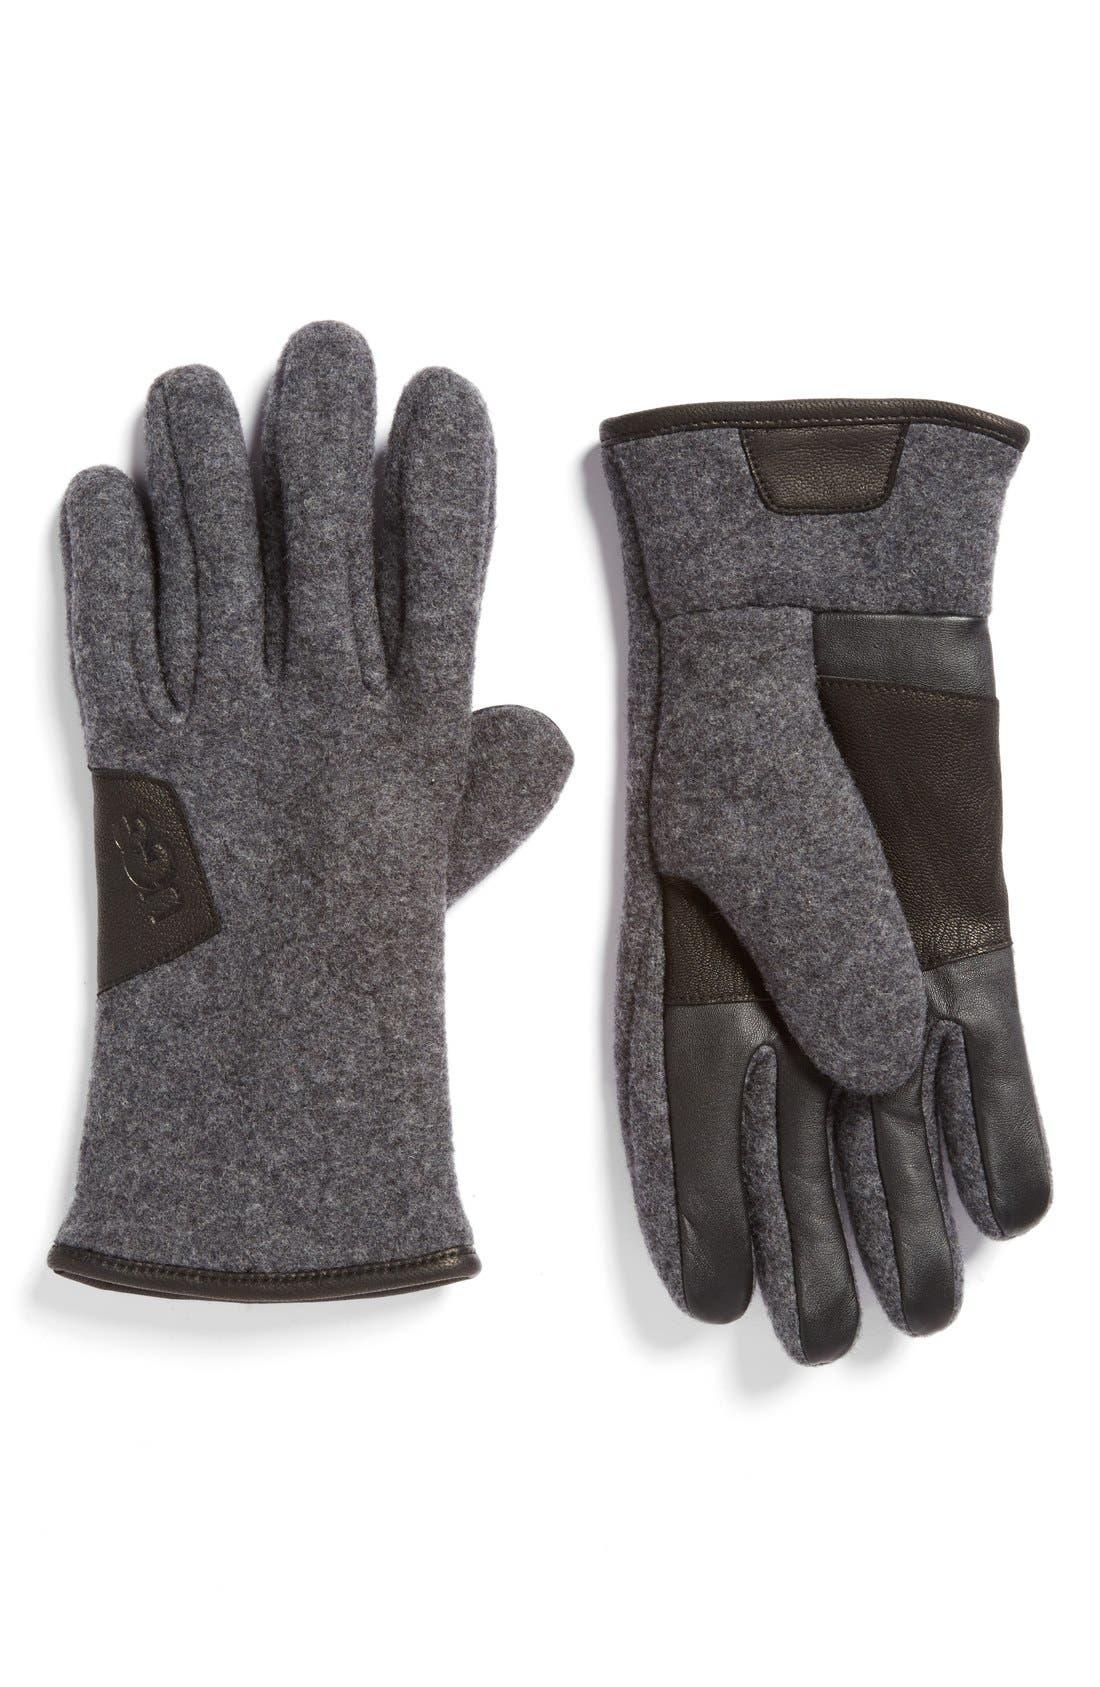 Wool Blend Tech Gloves,                             Main thumbnail 1, color,                             Charcoal